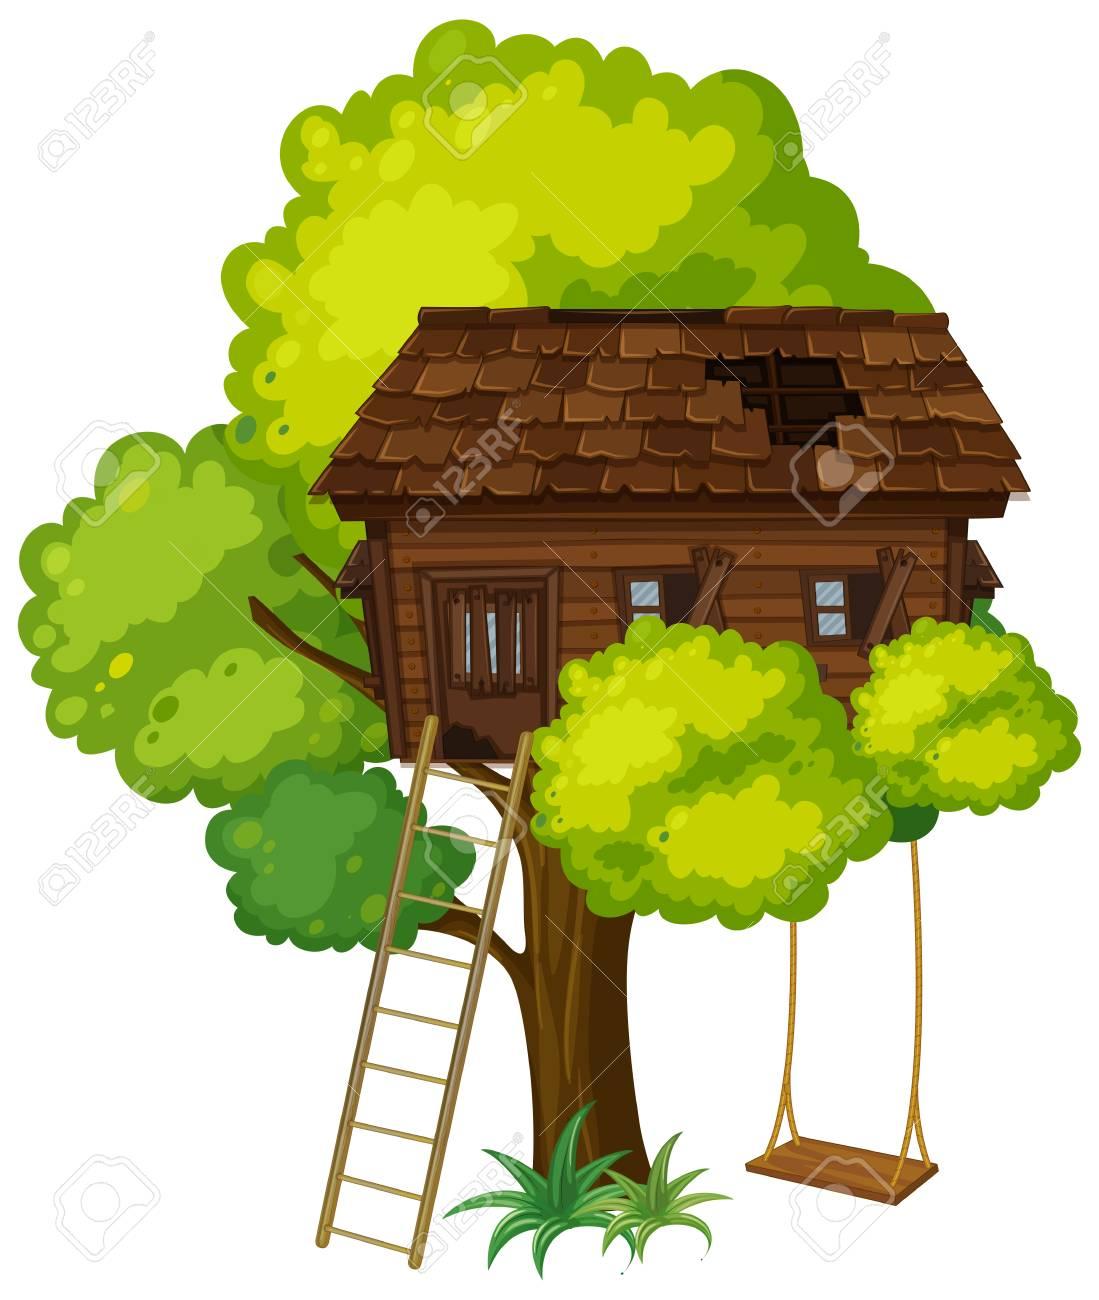 treehouse with swing on the tree illustration royalty free cliparts rh 123rf com Magic Tree House tree house clip art free